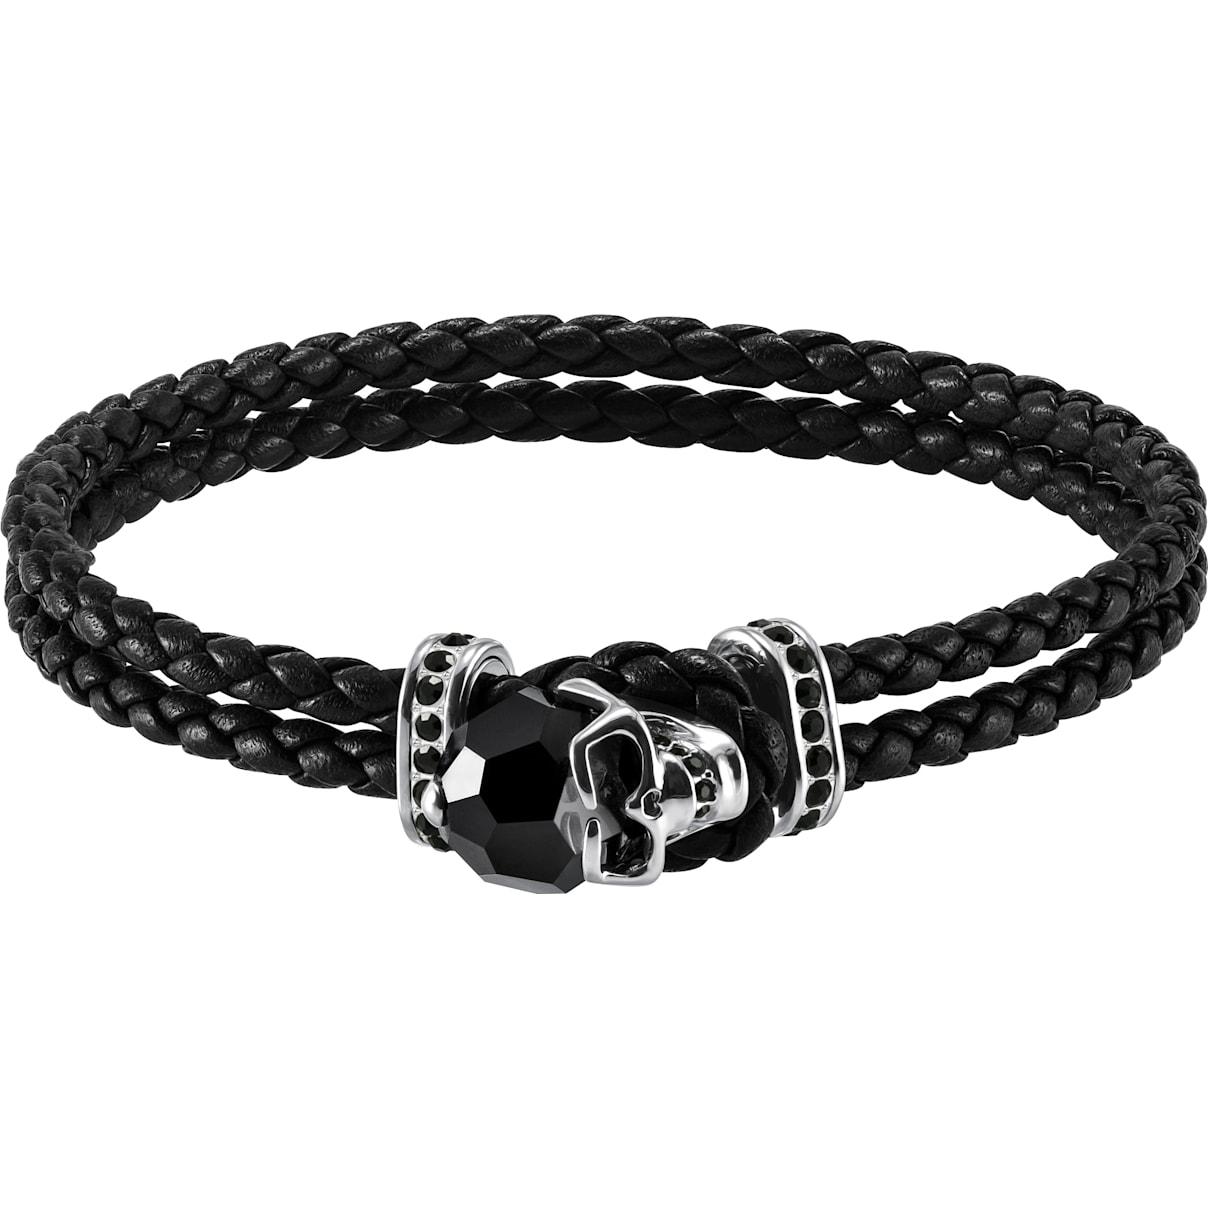 Swarovski Taddeo Bracelet, Leather, Black, Palladium plated